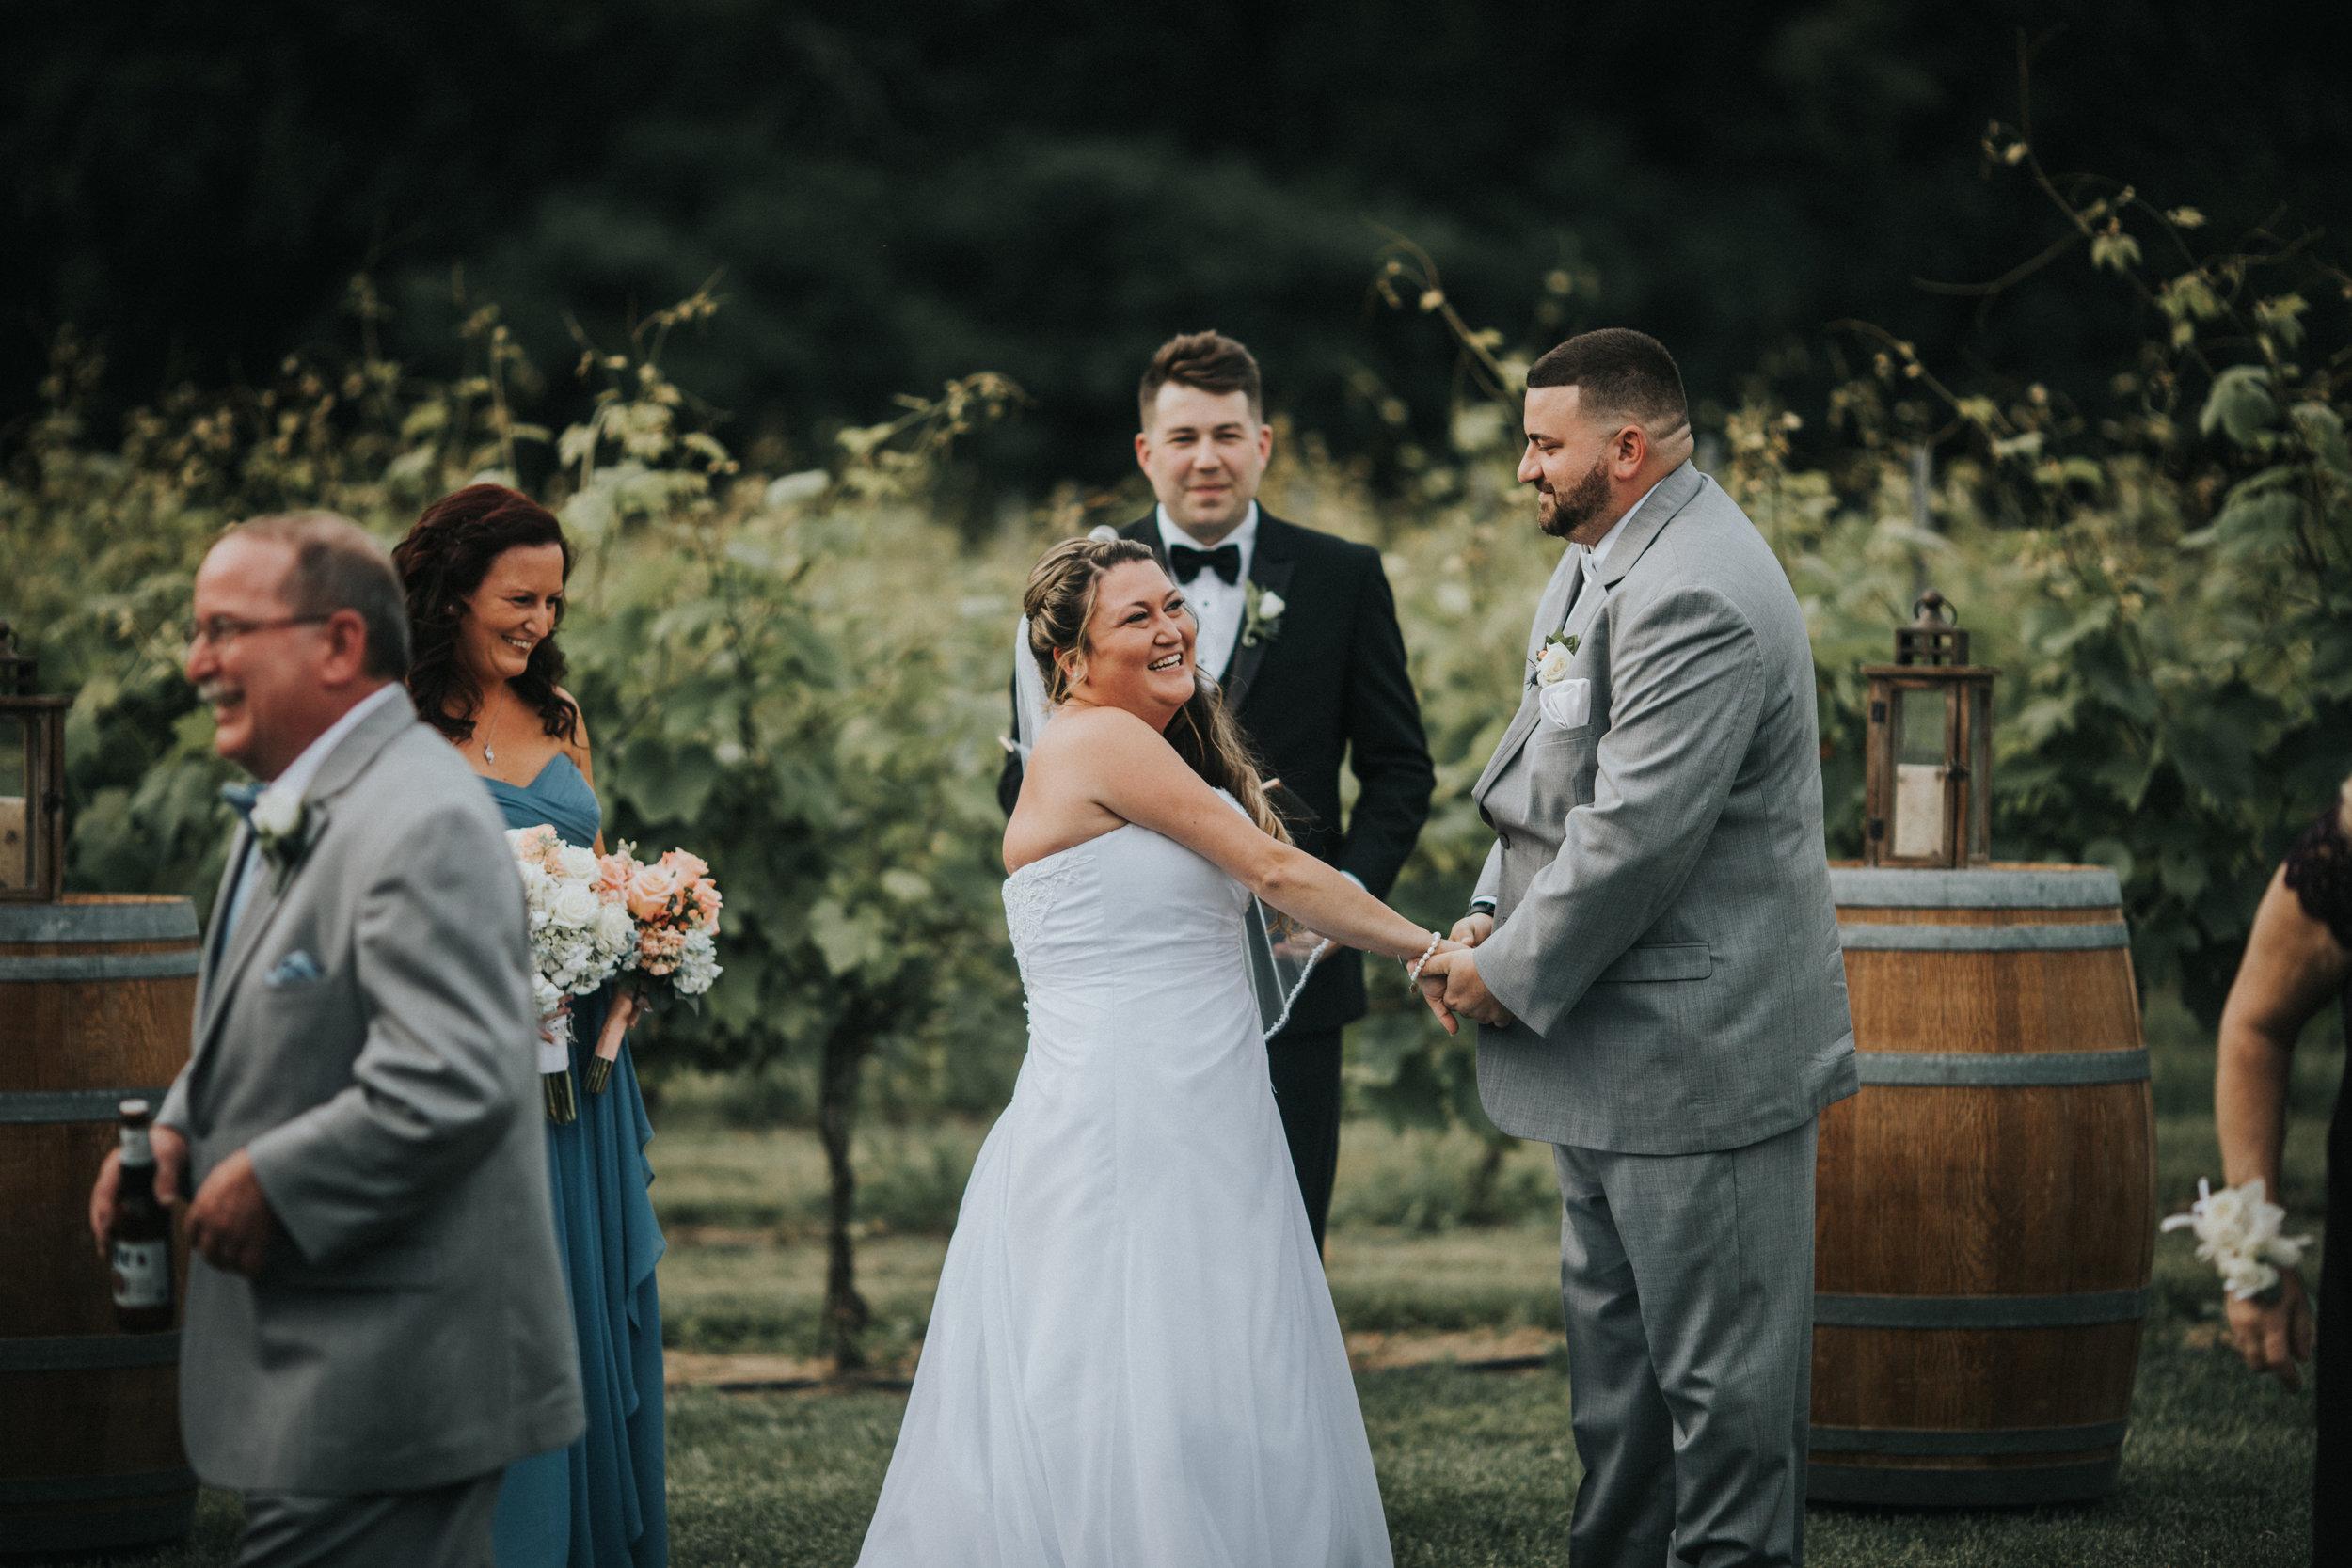 New-Jersey-Wedding-Photographer-JennaLynnPhotography-ValenzanoWinery-Ceremony-92.jpg